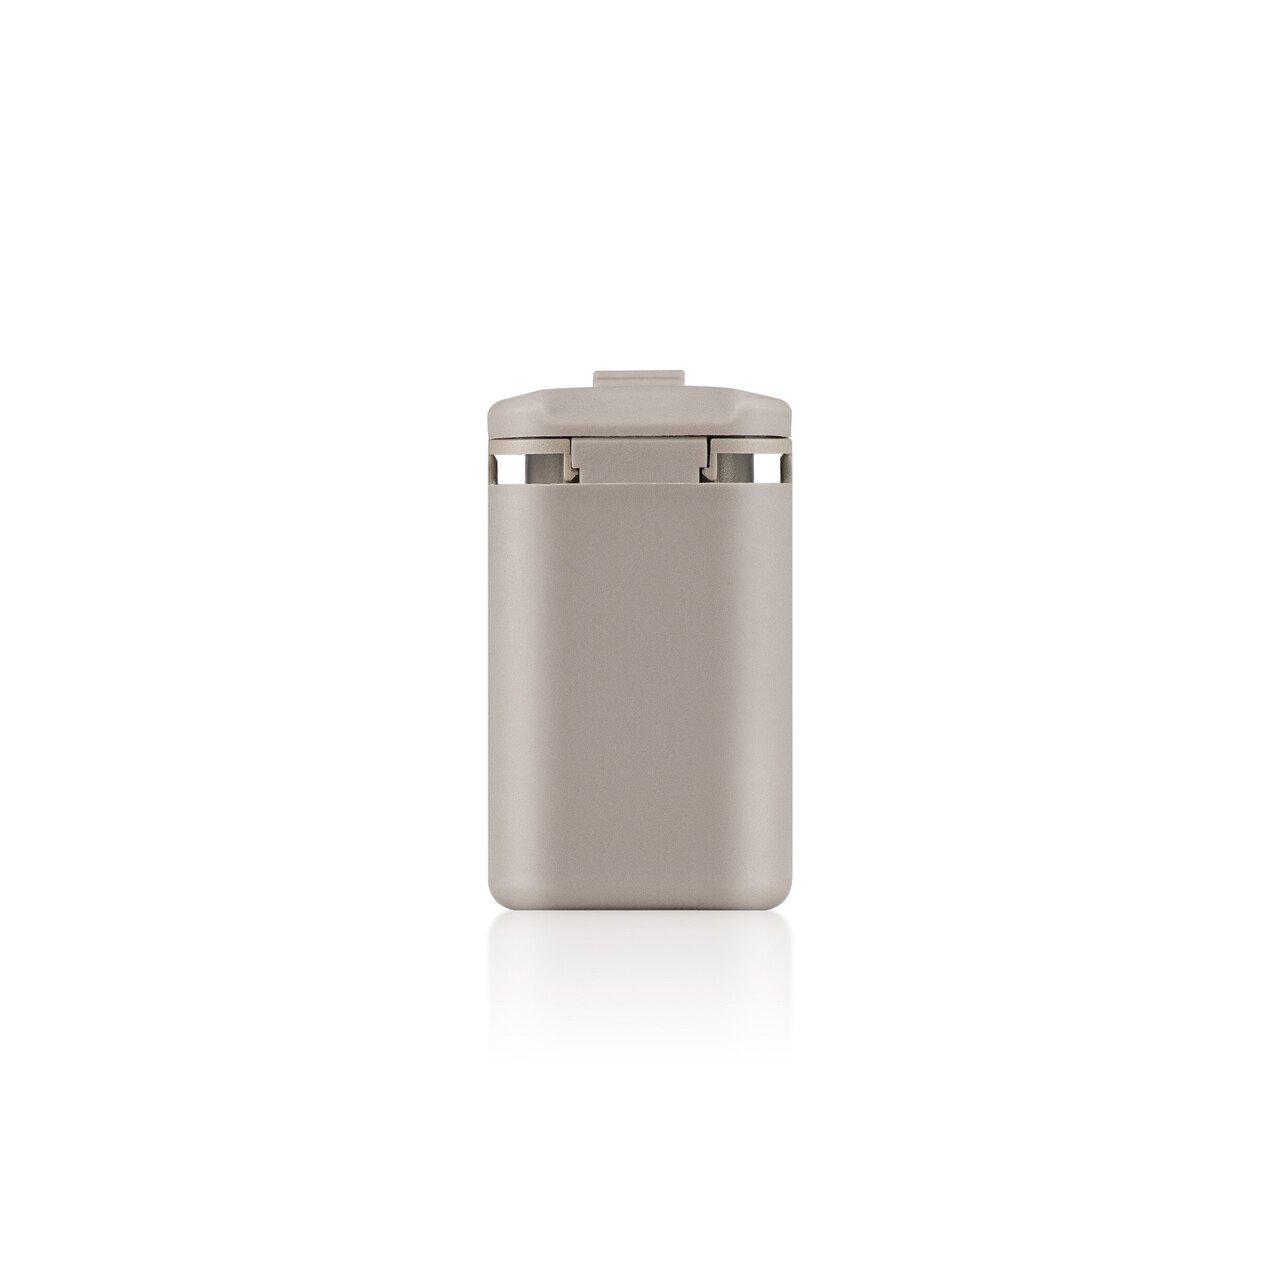 DOT LEAF  (ドットリーフ) 交換用チャンバー (単品) ヴェポライザー コンダクション 加熱式タバコ